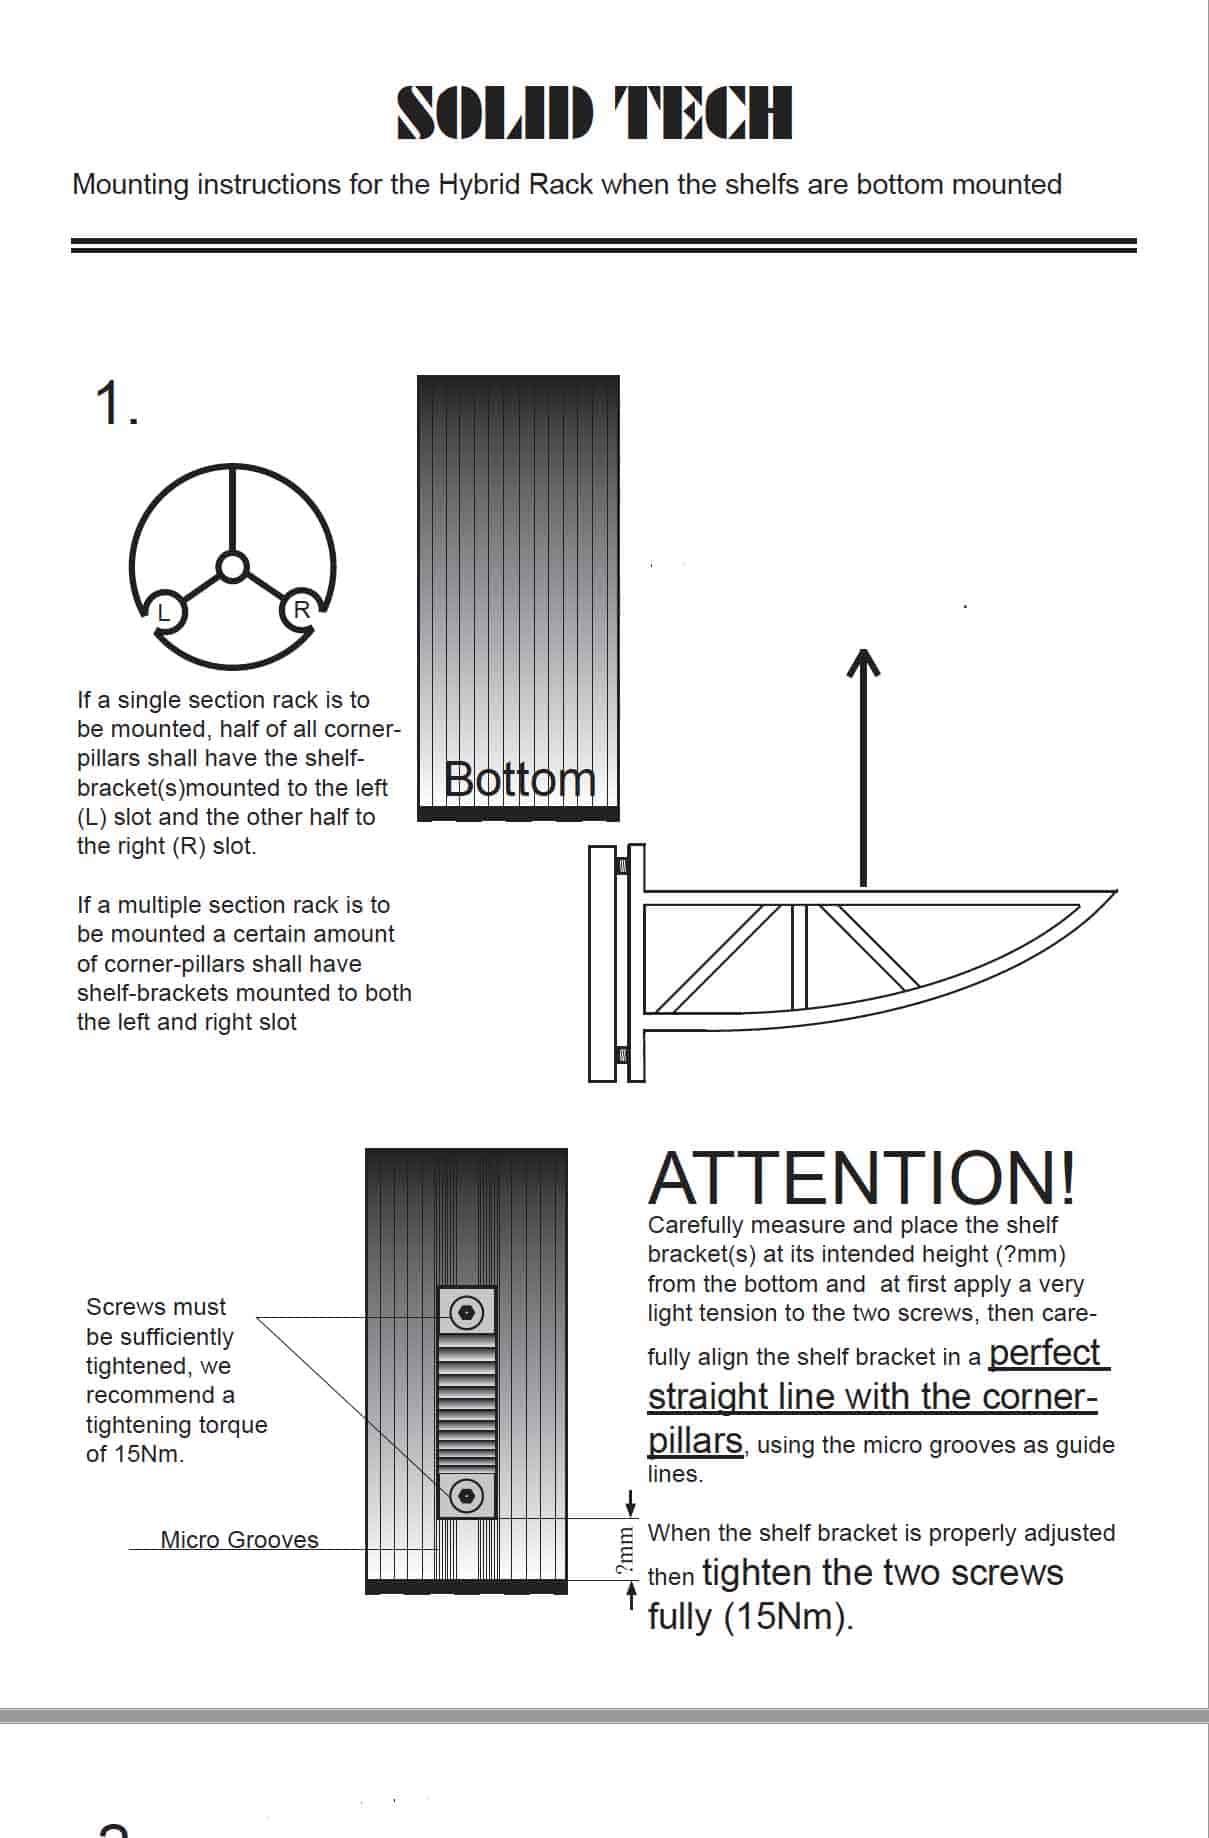 Hybrid Bottom Mounted Shelves Assembly Instructions concrete shelves Image